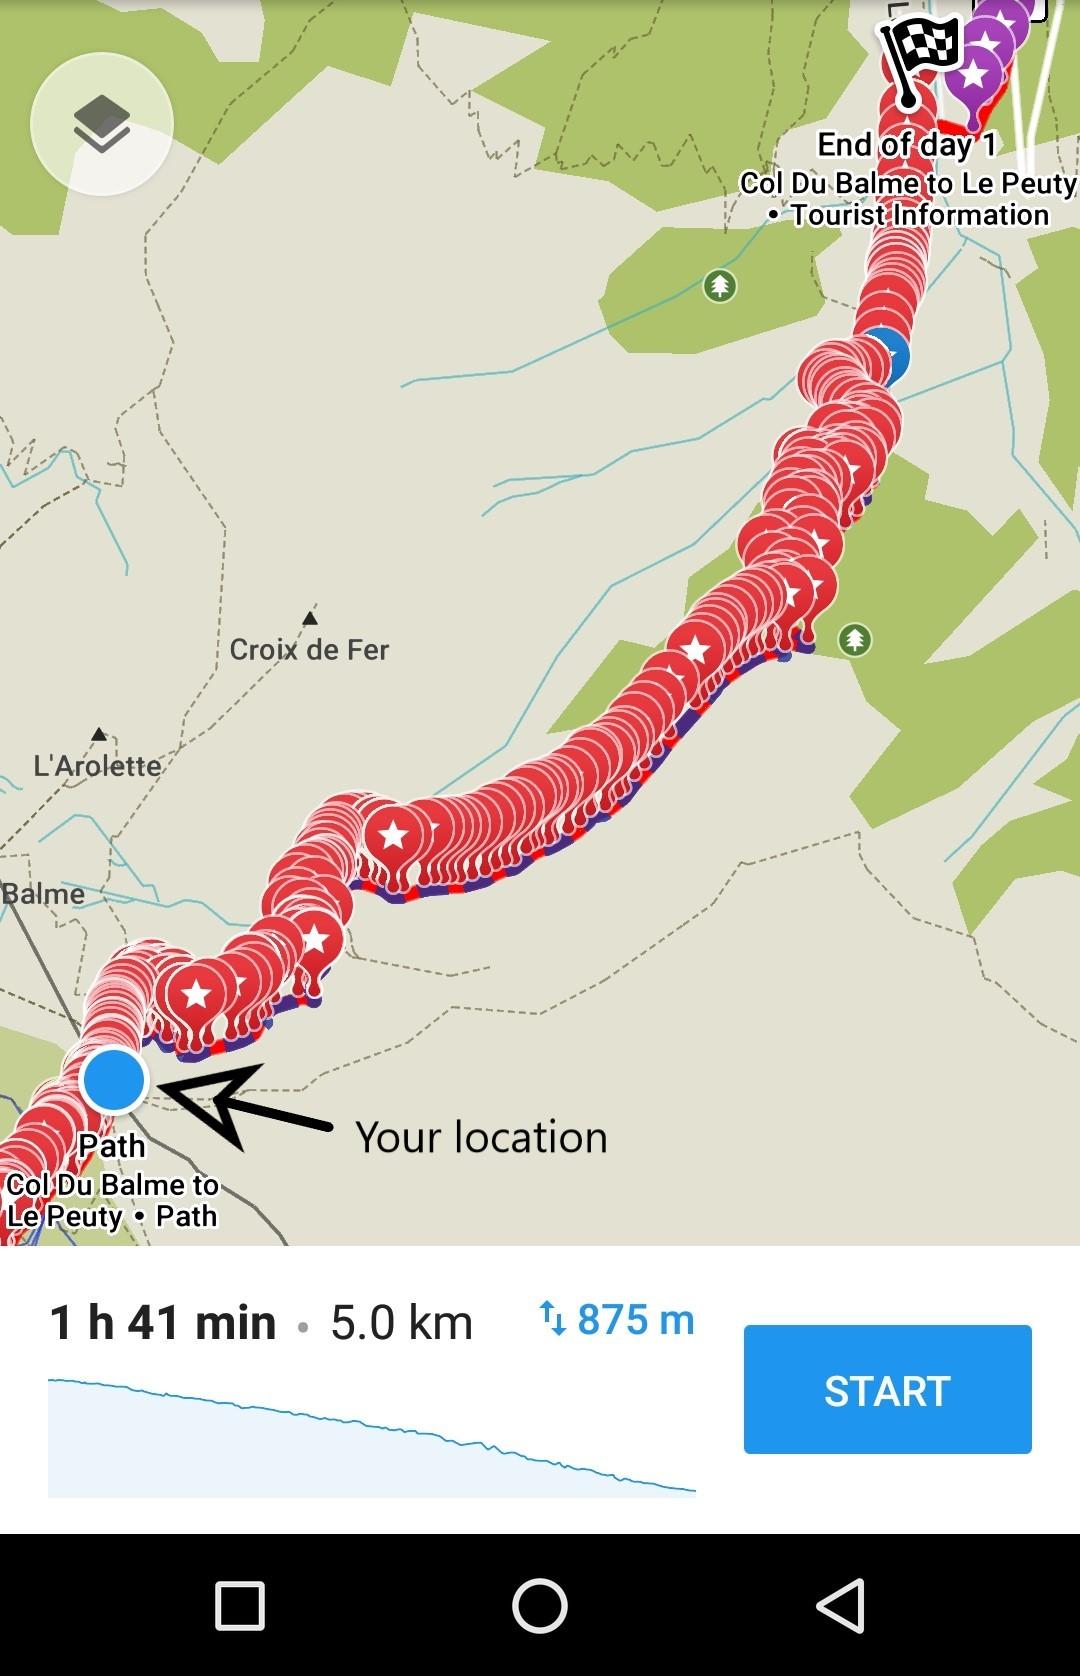 Chamonix to Zermatt maps with GPS coordinates